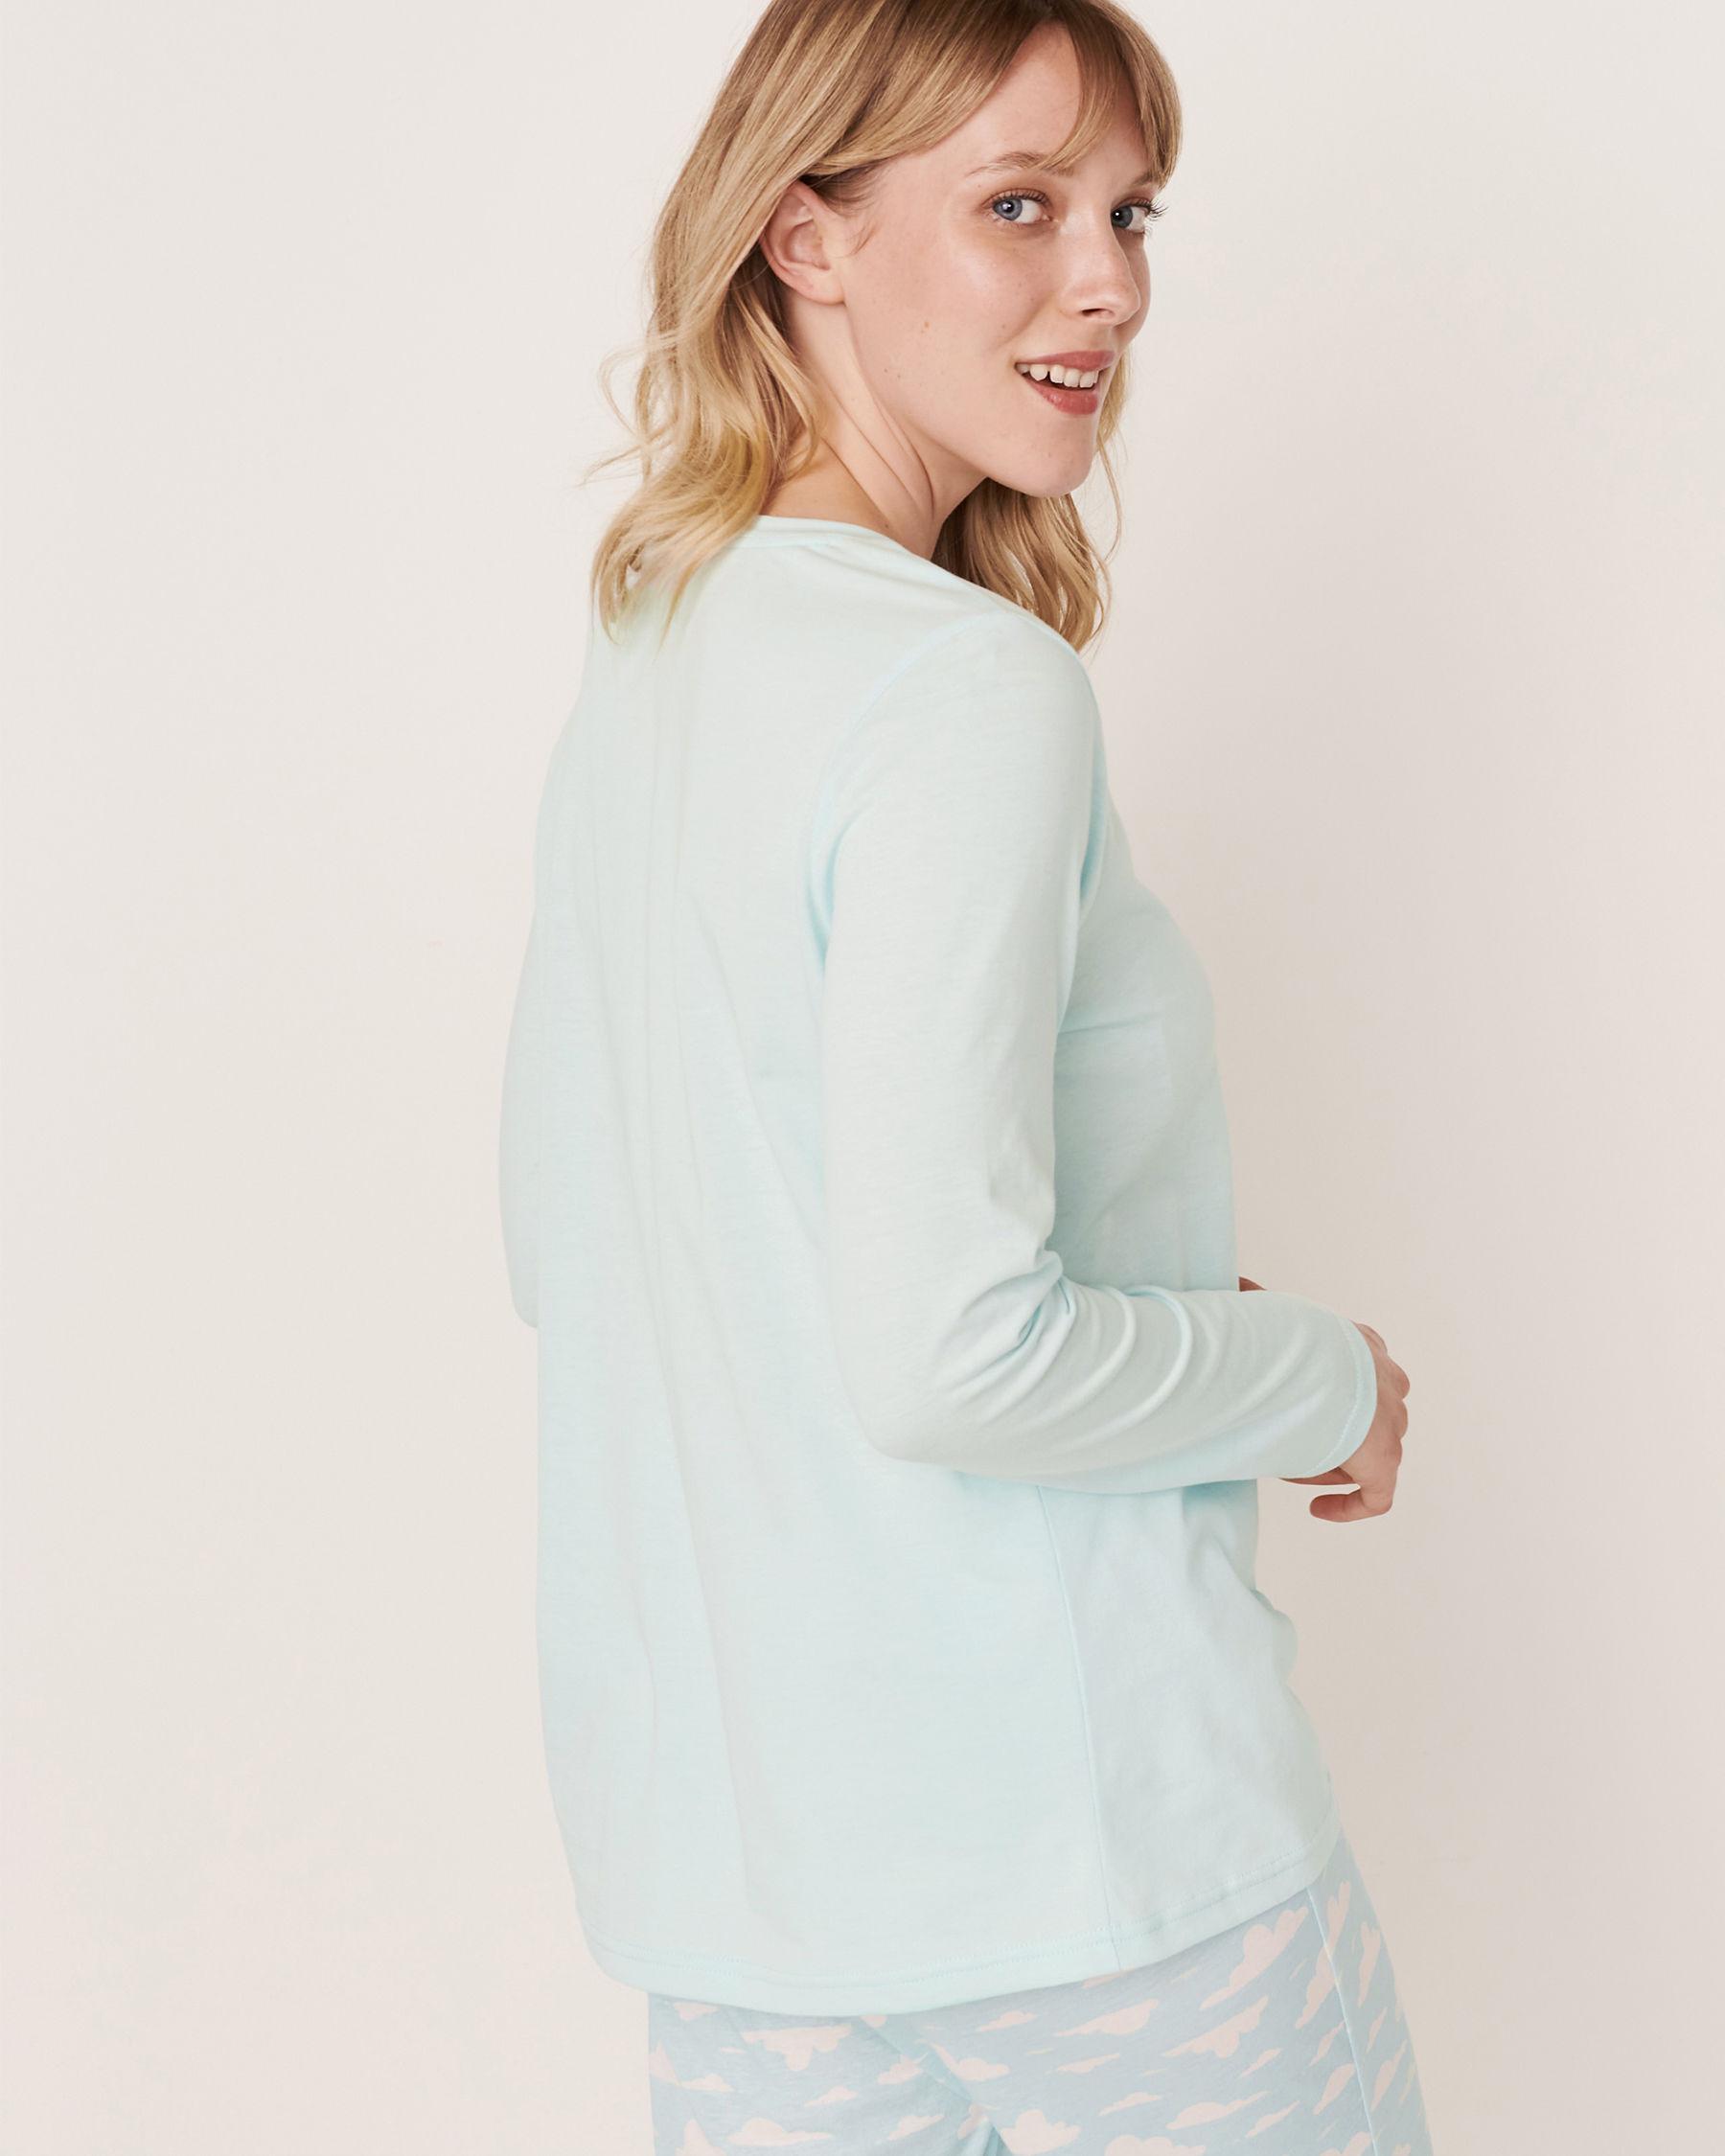 LA VIE EN ROSE Scoop Neck Long Sleeve Shirt Blue glow 40100169 - View2